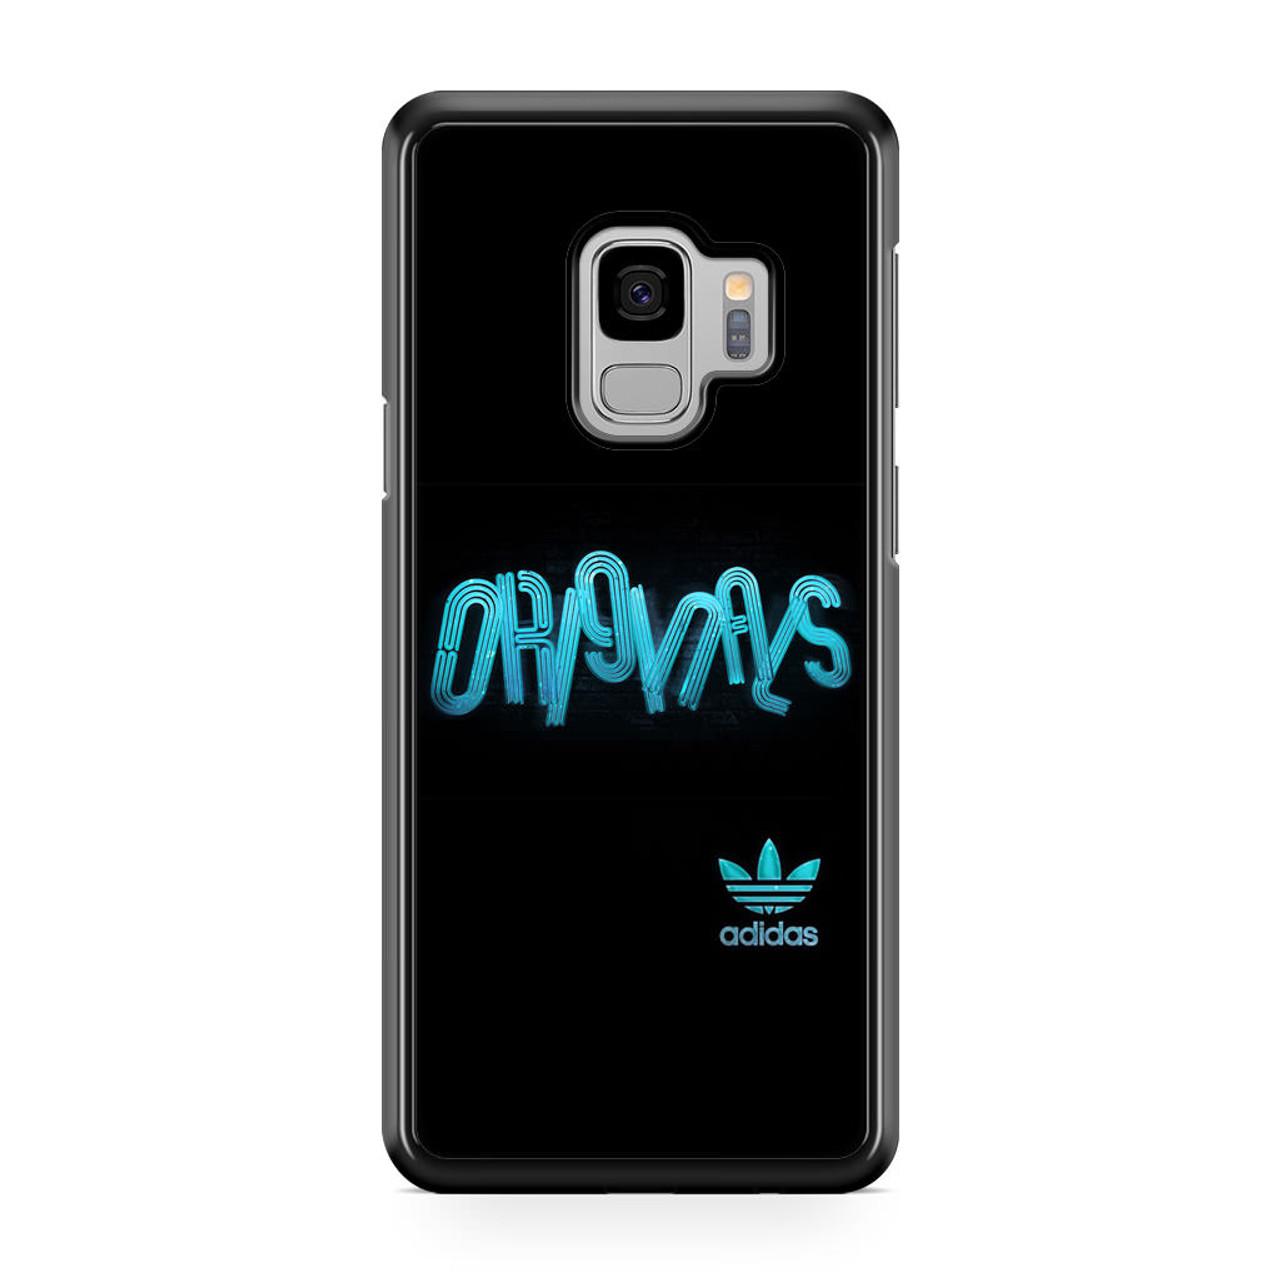 the latest 3b007 6f035 Adidas Originals Samsung Galaxy S9 Case